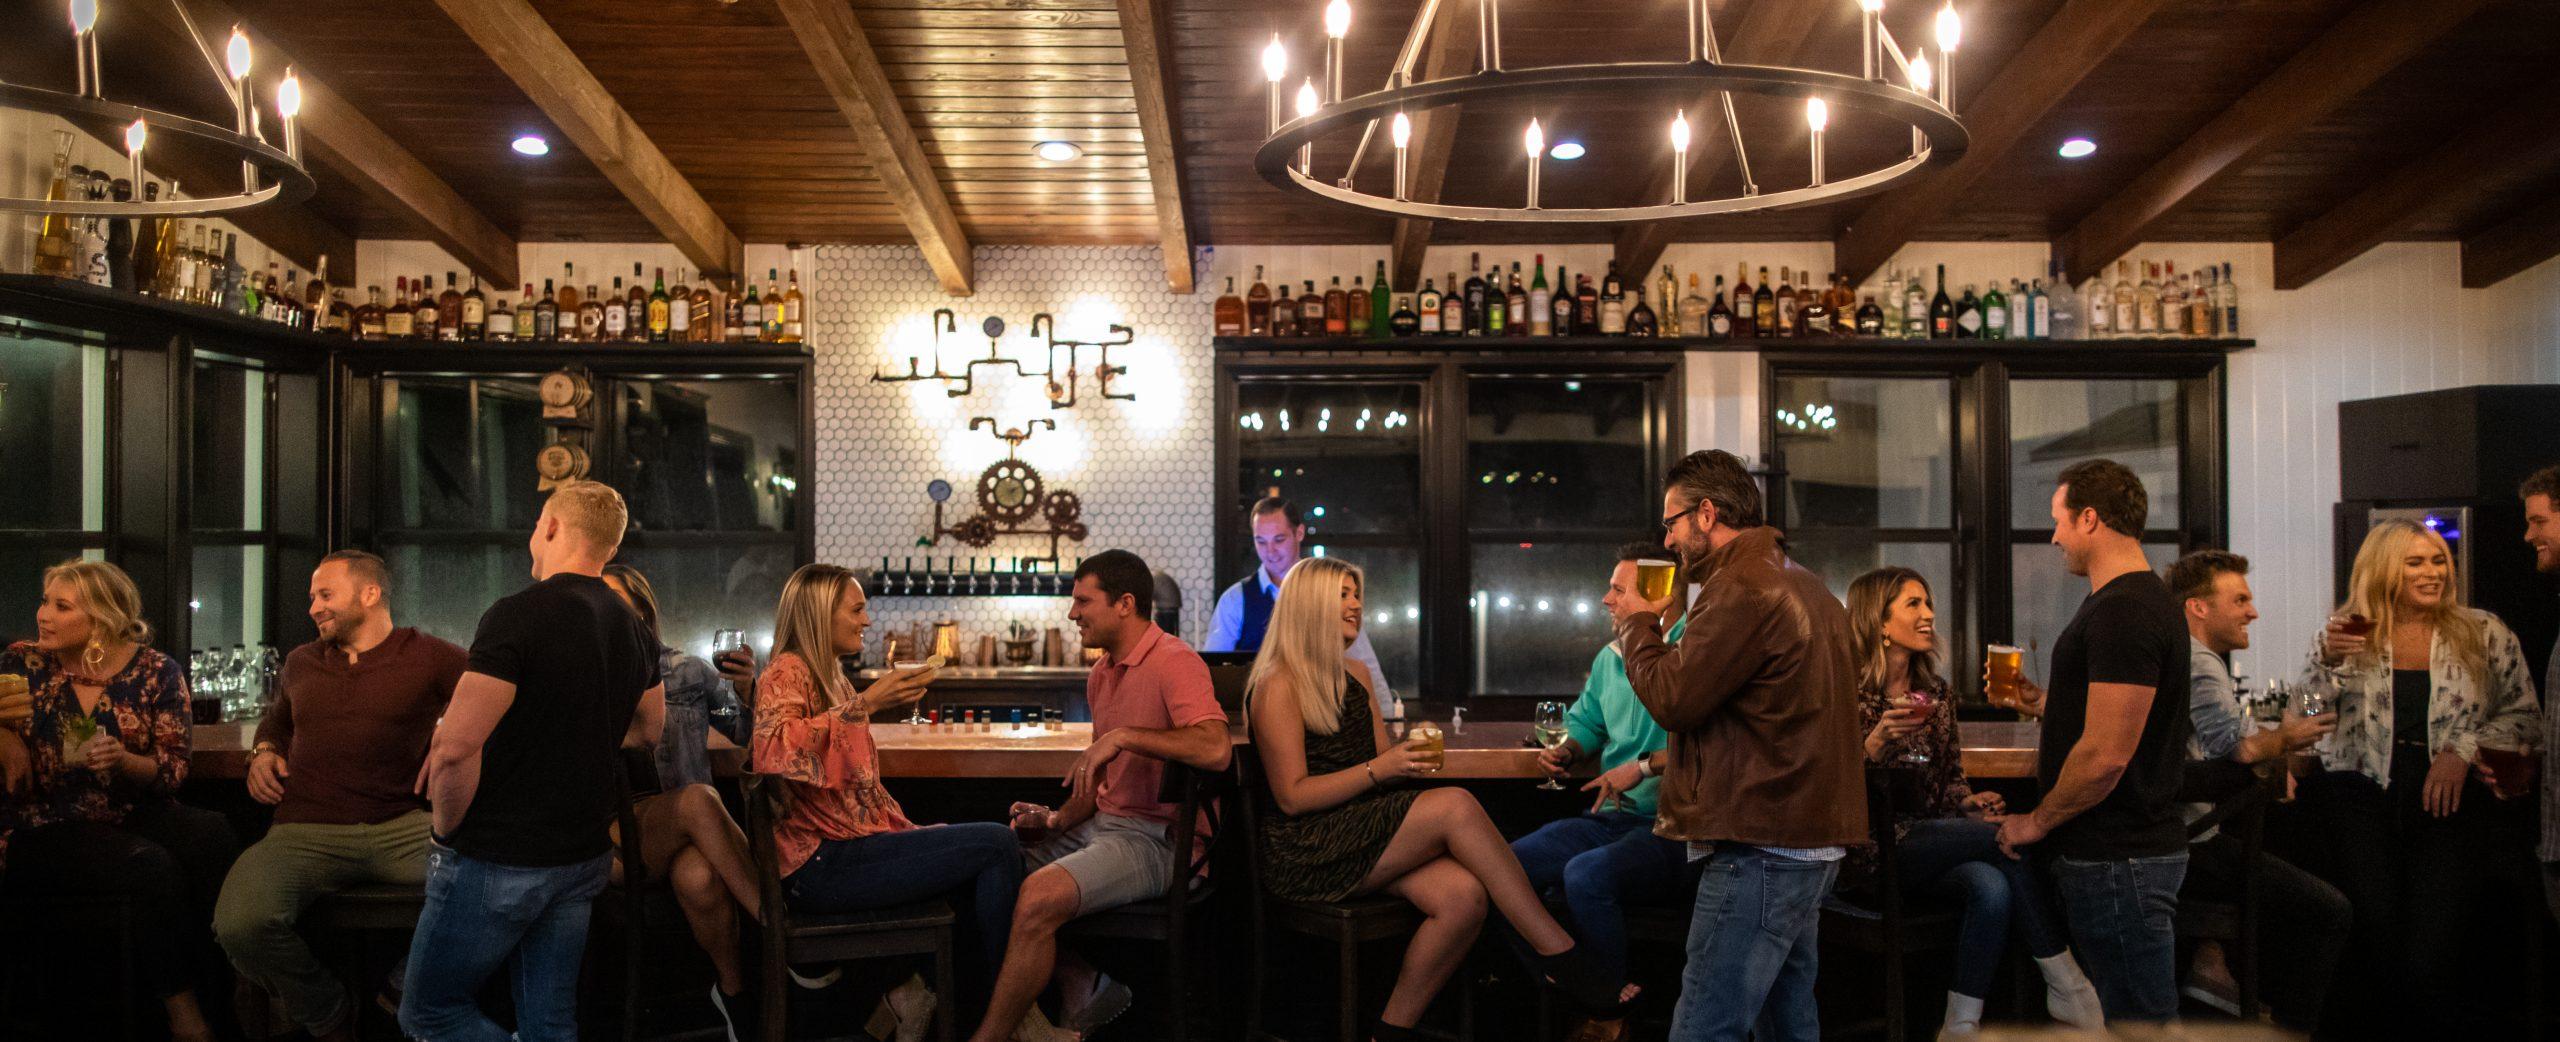 Farm & Fire Southern Pizzeria Opens in Santa Rosa Beach